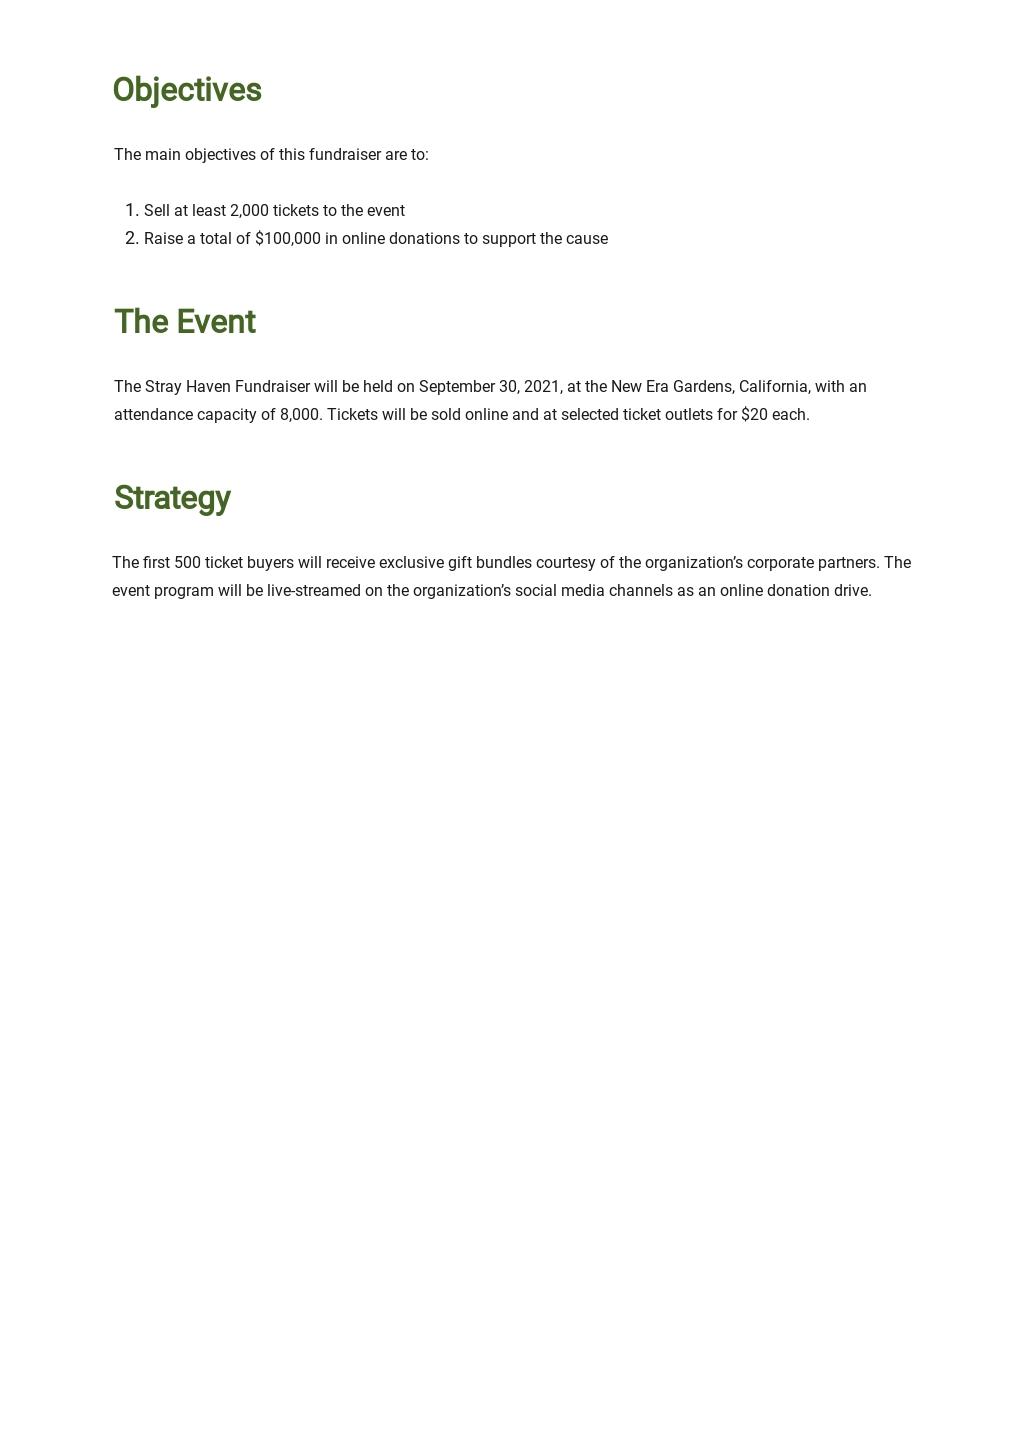 Sample Fundraising Plan Template 1.jpe